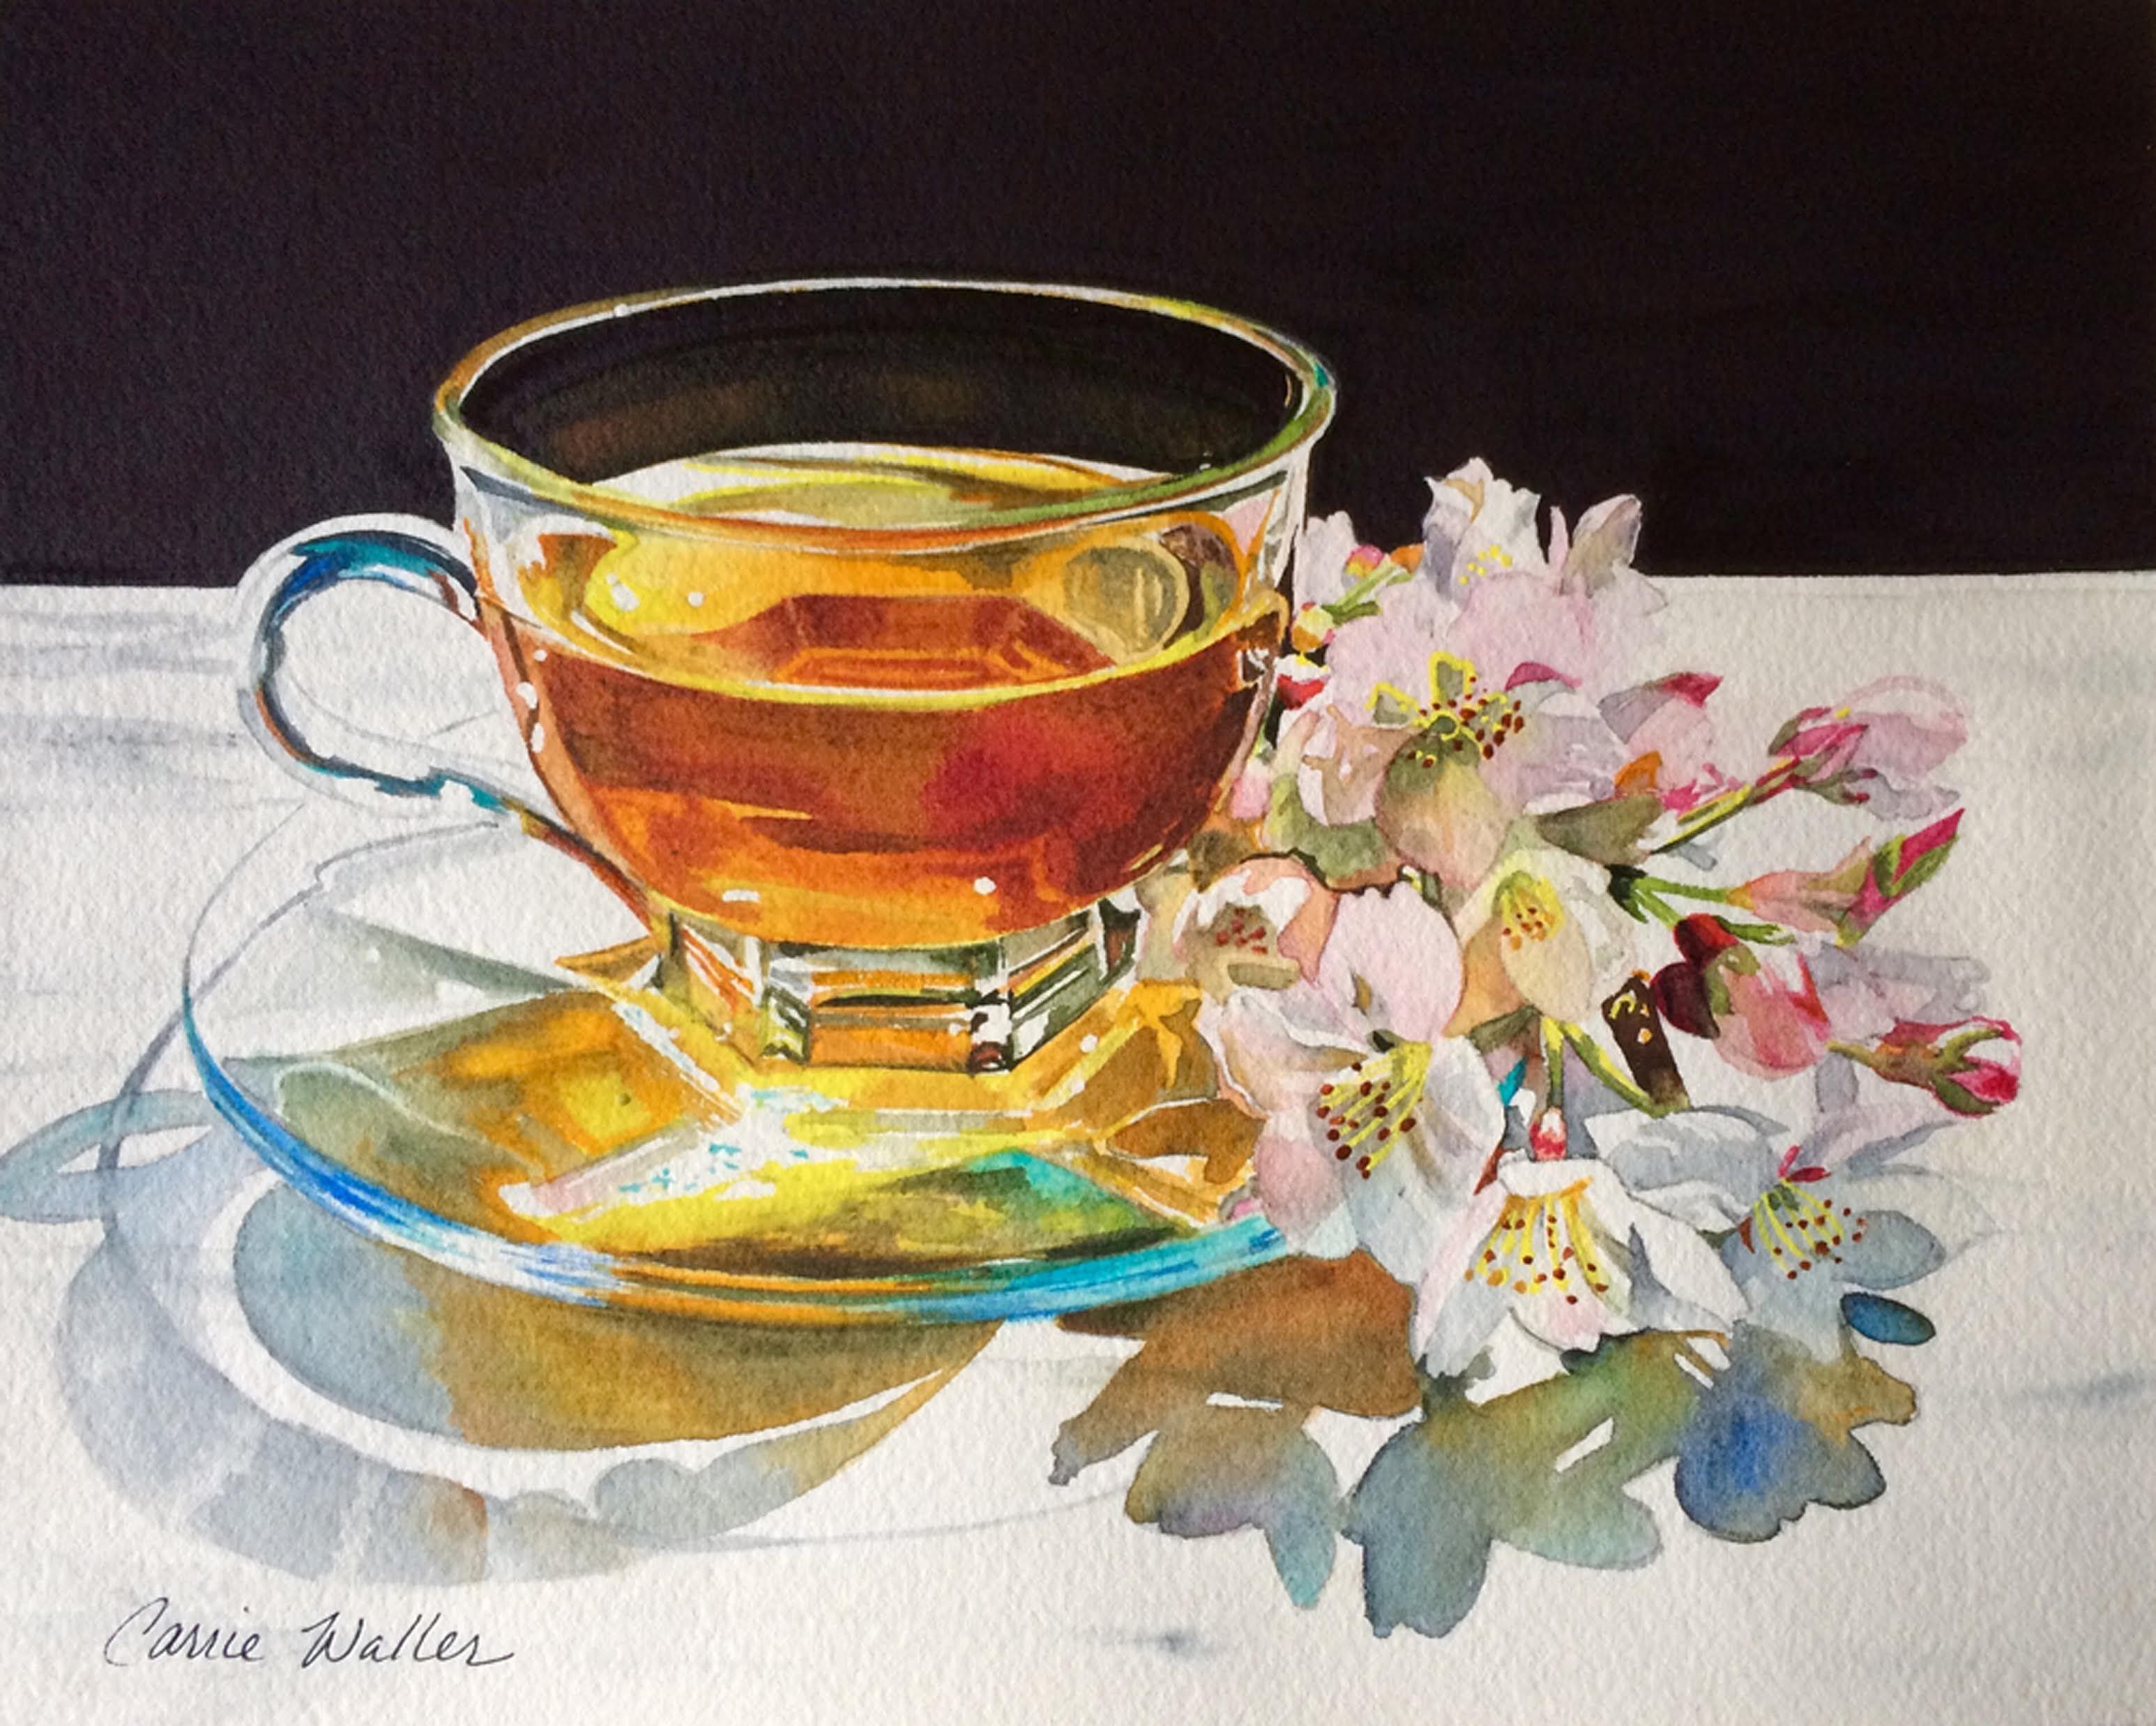 Carrie Waller Step By Step Sakura Tea Watercolor Lessons